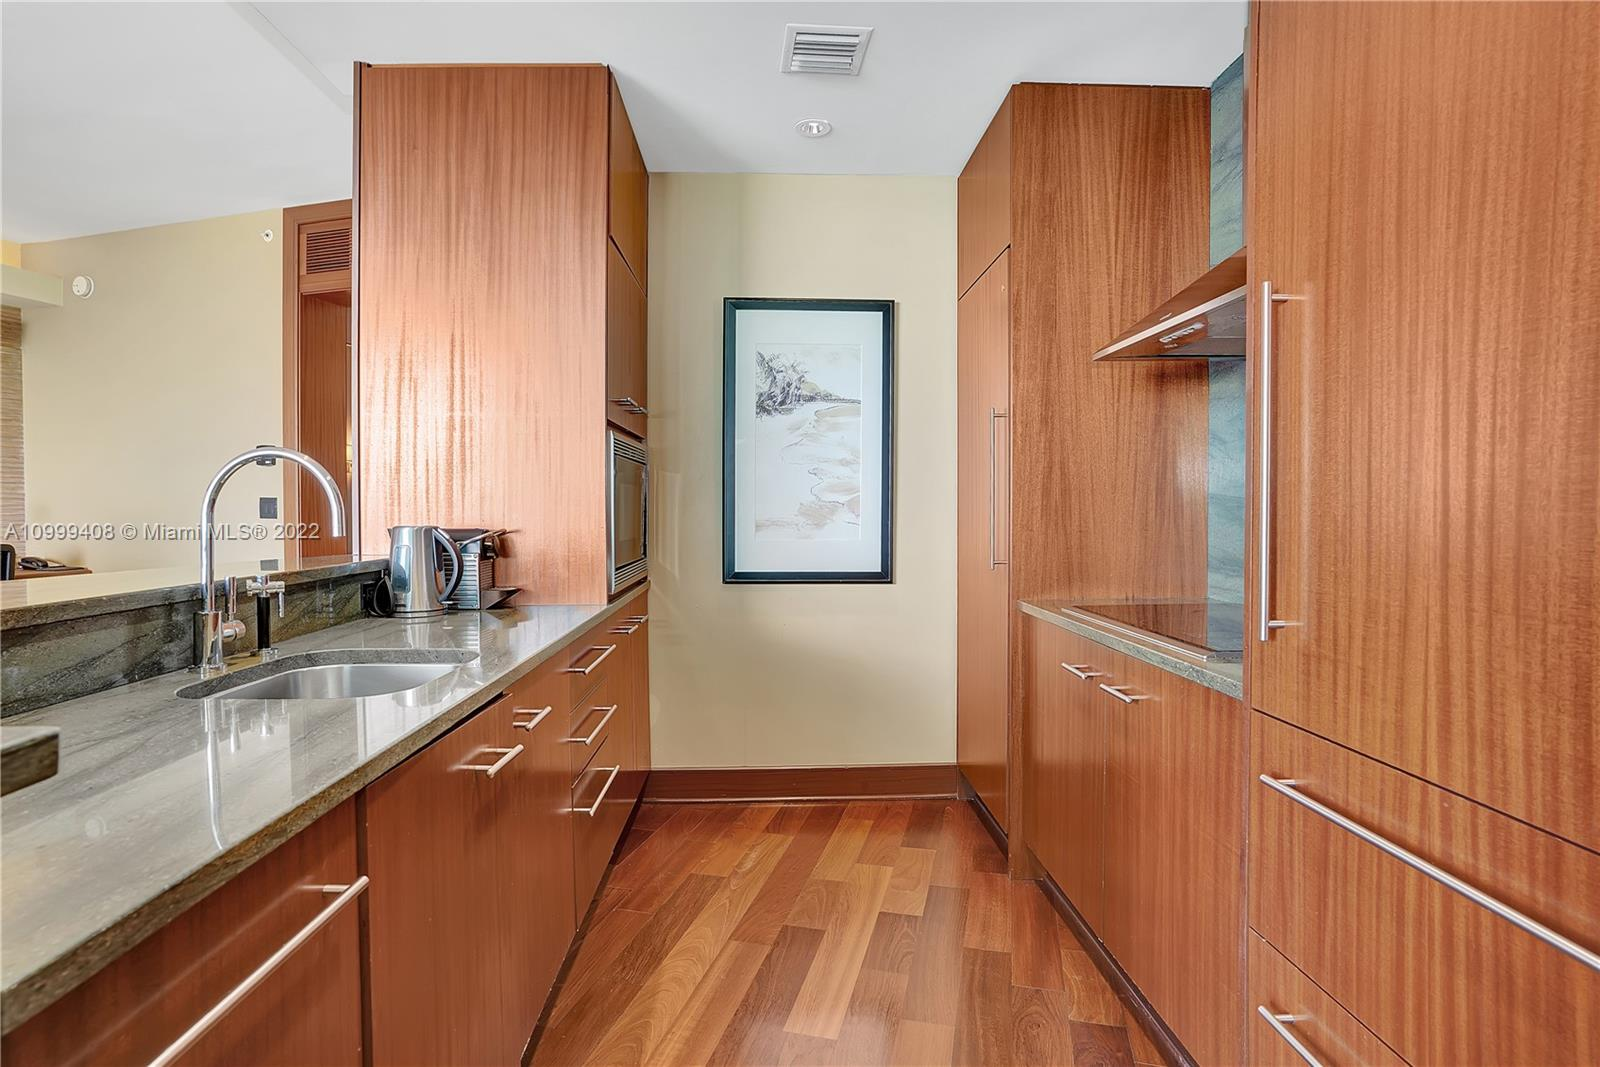 KITCHEN: fridge, freezer, dishwasher, microwave oven, 4-range stove, washer/dryer